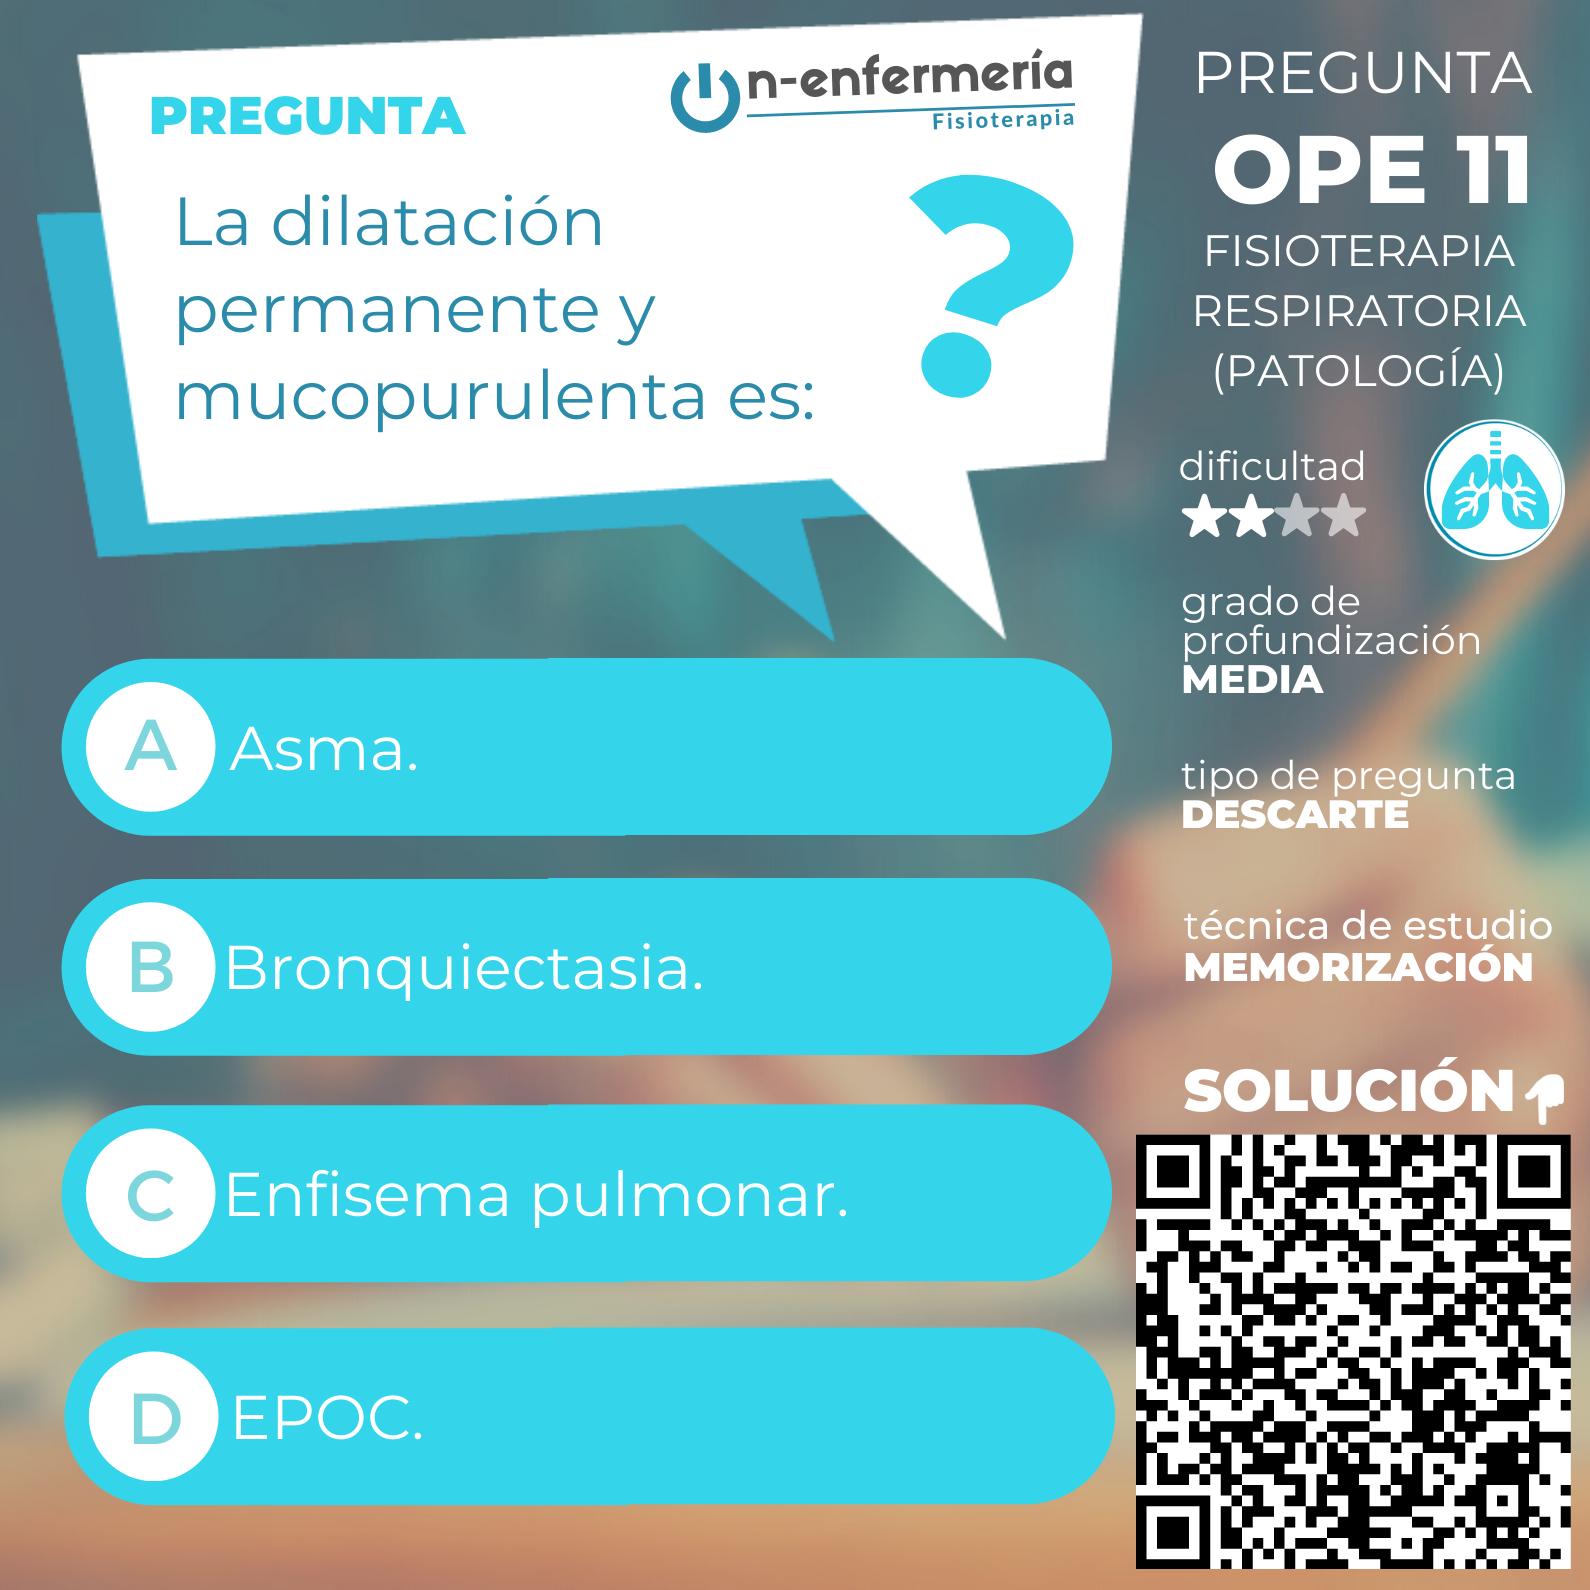 Pregunta examen OPE Fisioterapia nº 11 - Fisioterapia respiratoria